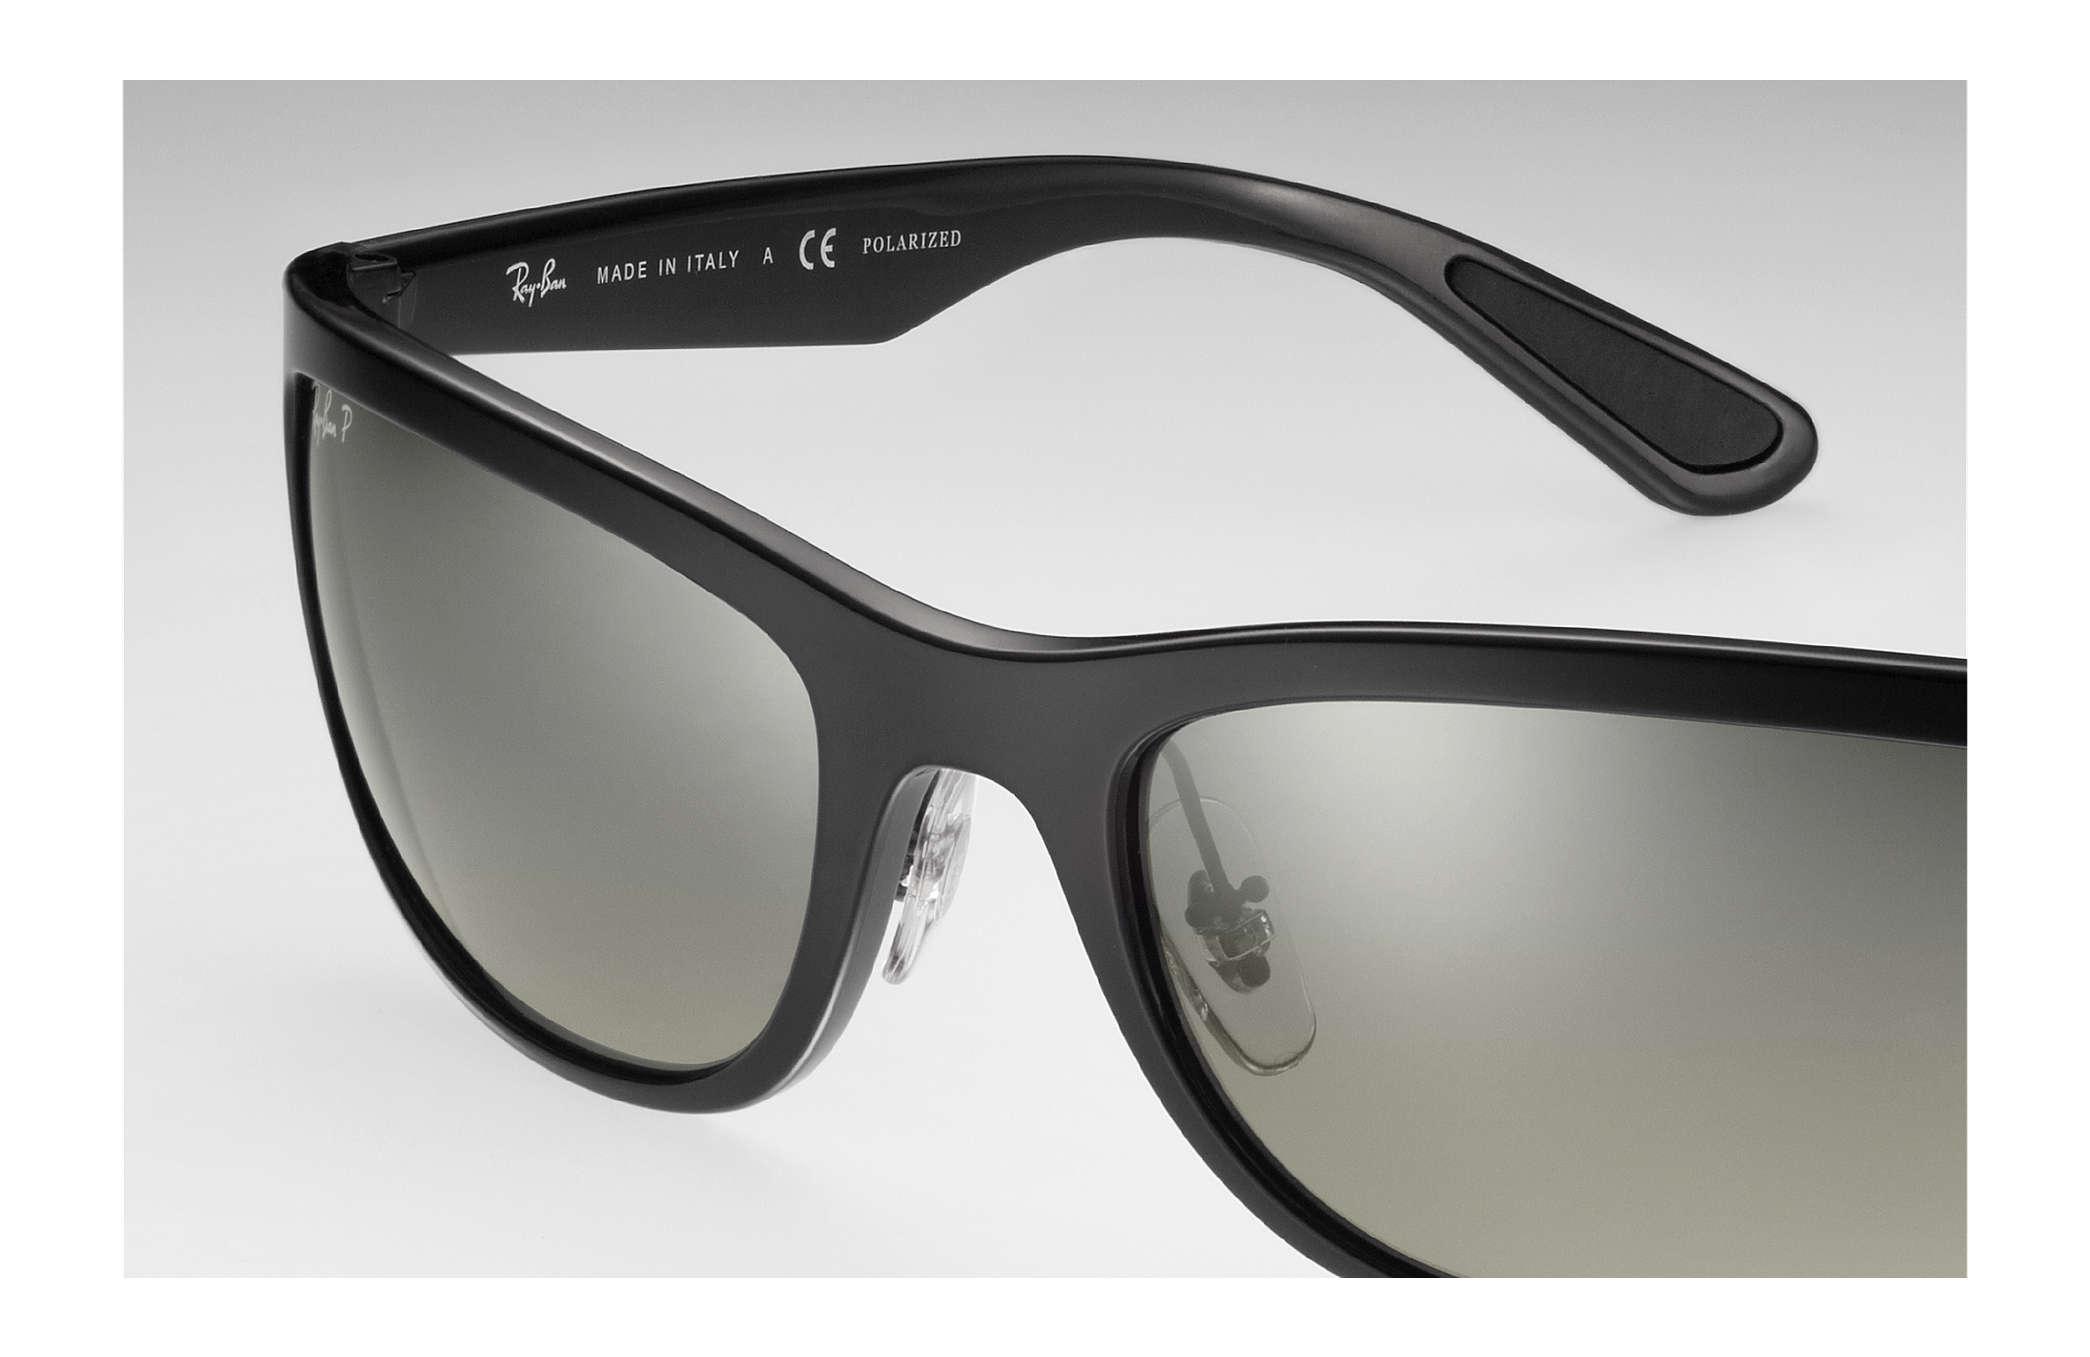 c325e5f2b3bfdb Ray-Ban Rb4265 Chromance RB4265 Black - Nylon - Silver Polarized ...